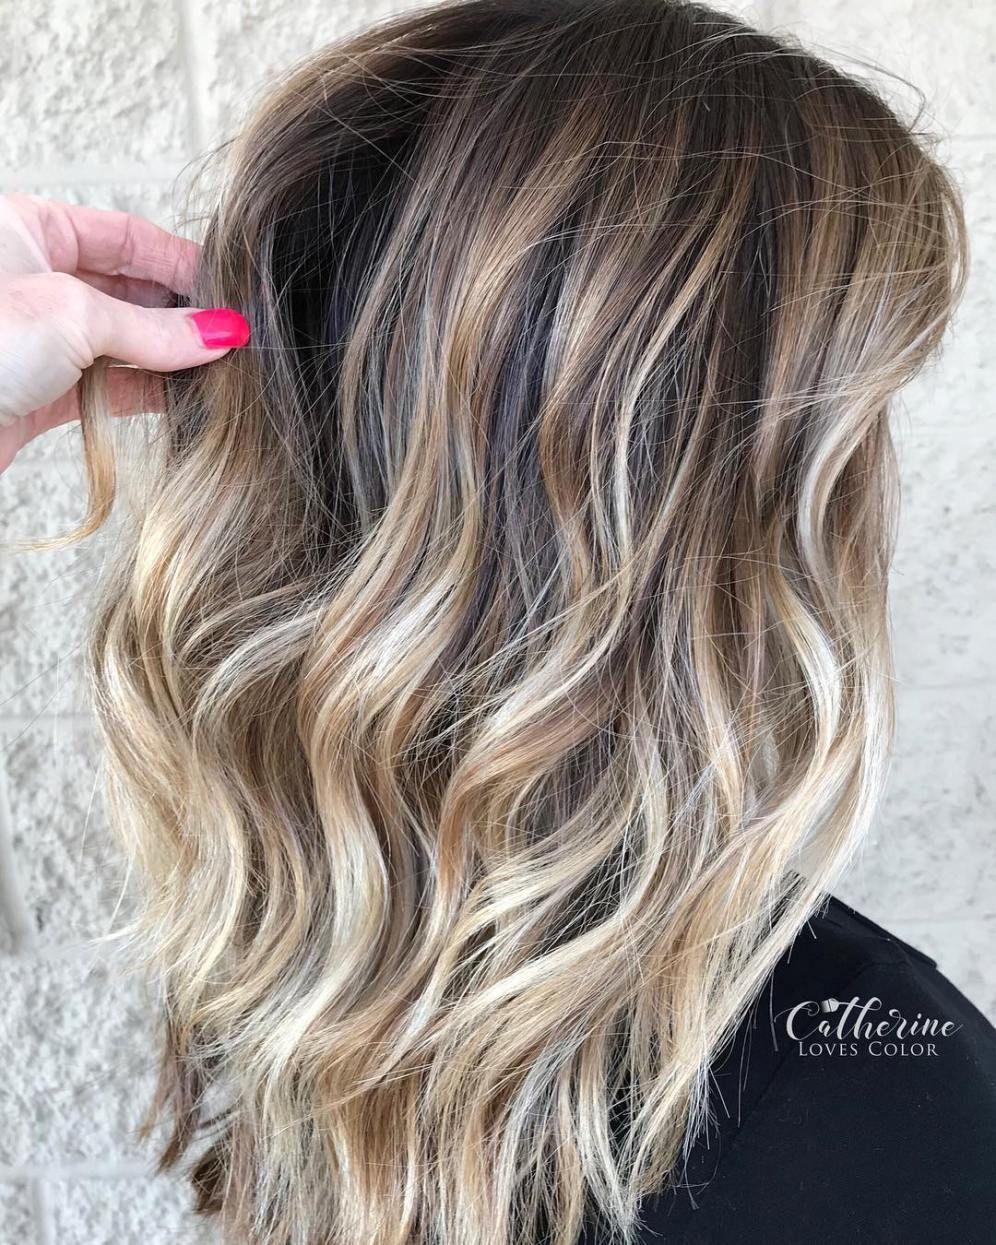 70 Flattering Balayage Hair Color Ideas for 2019 | Hair ...